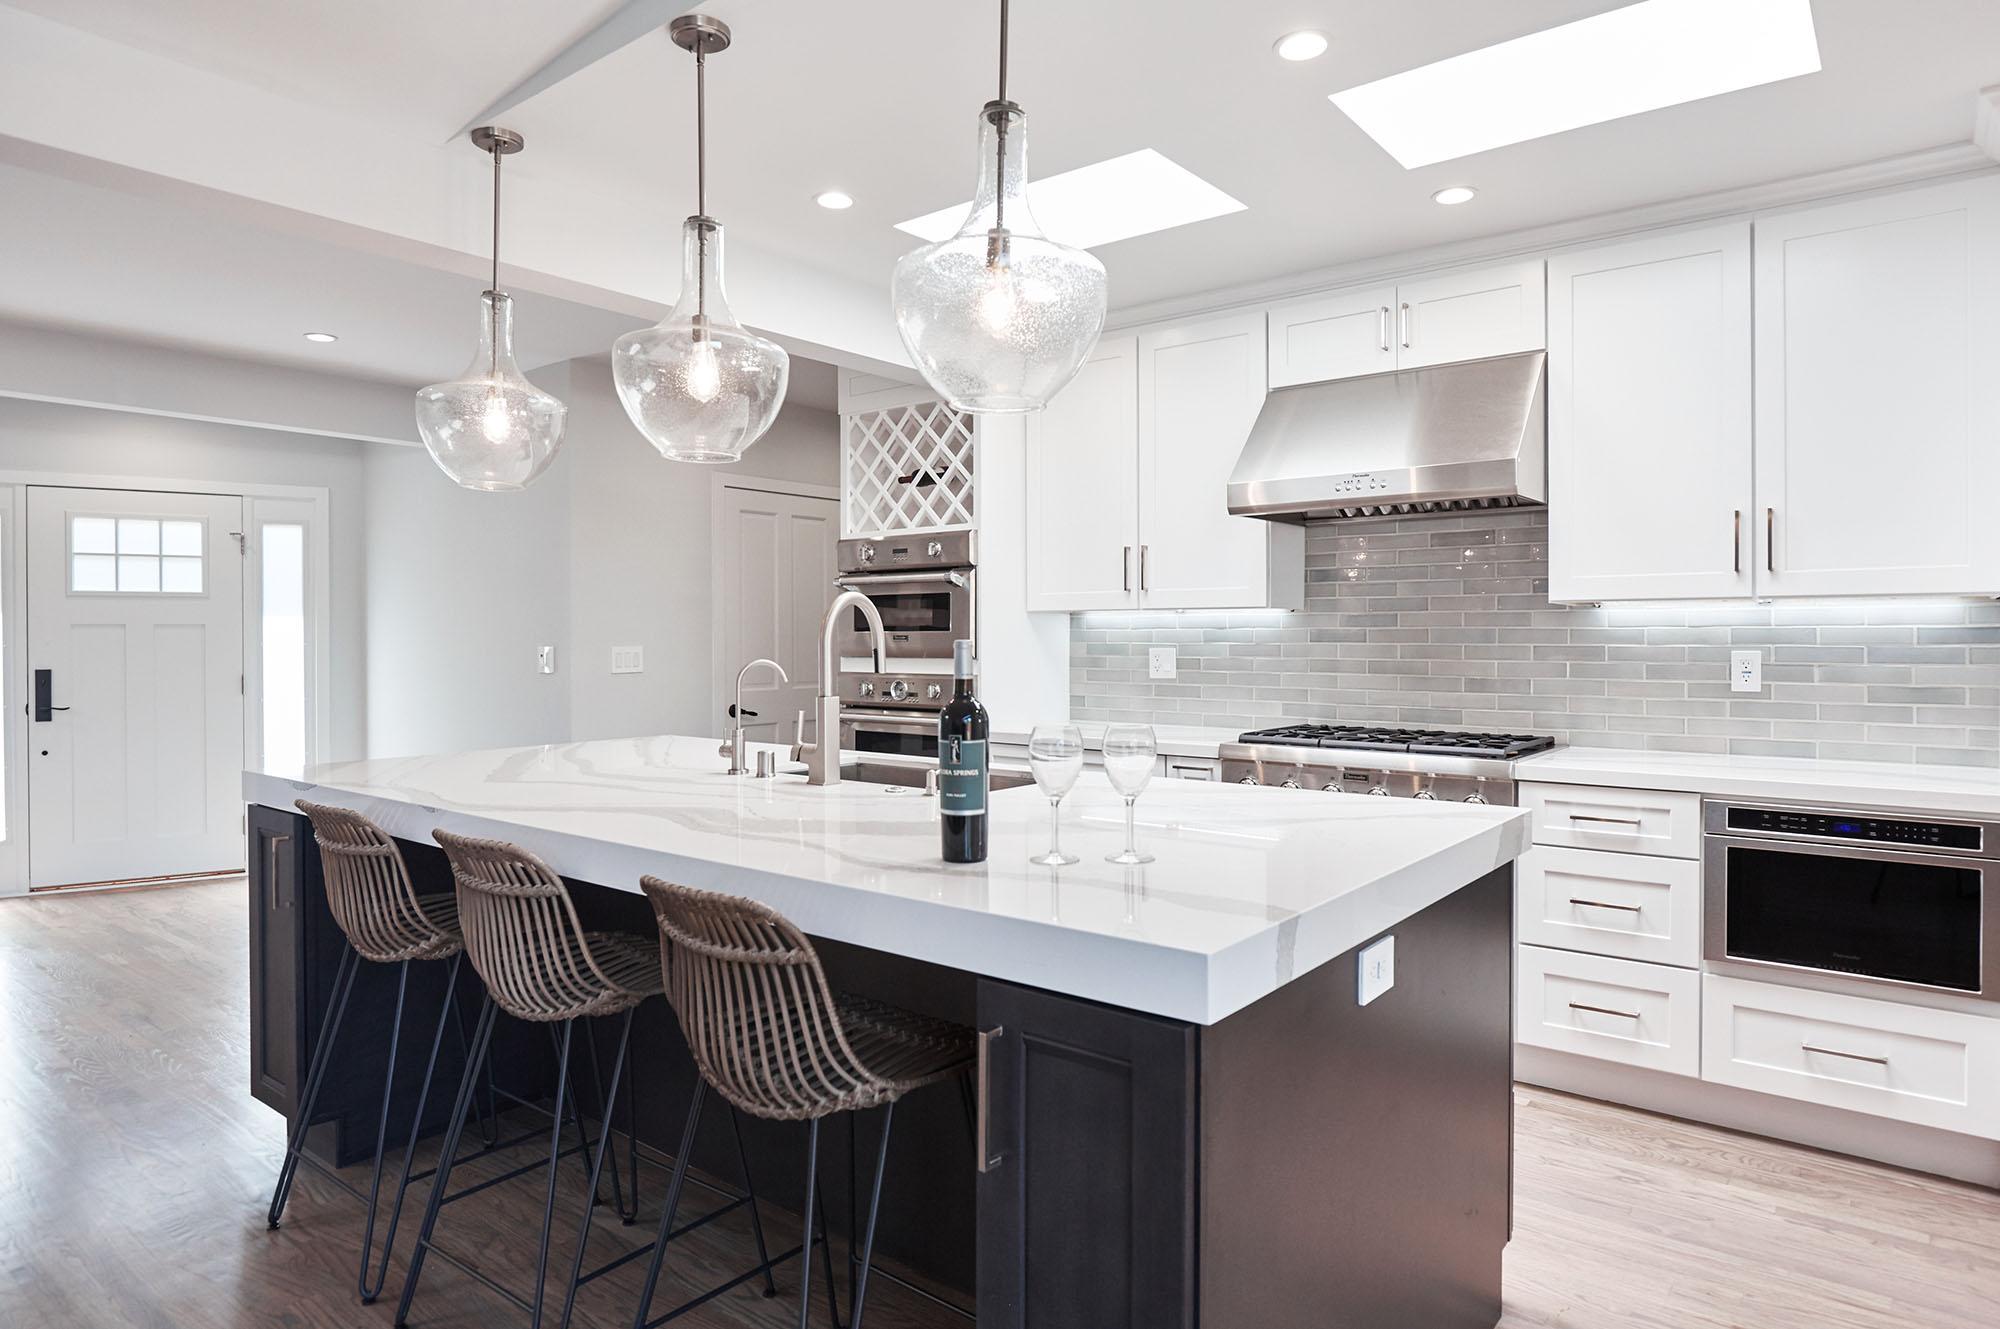 Studio City kitchen remodel 6 SMALL.jpg